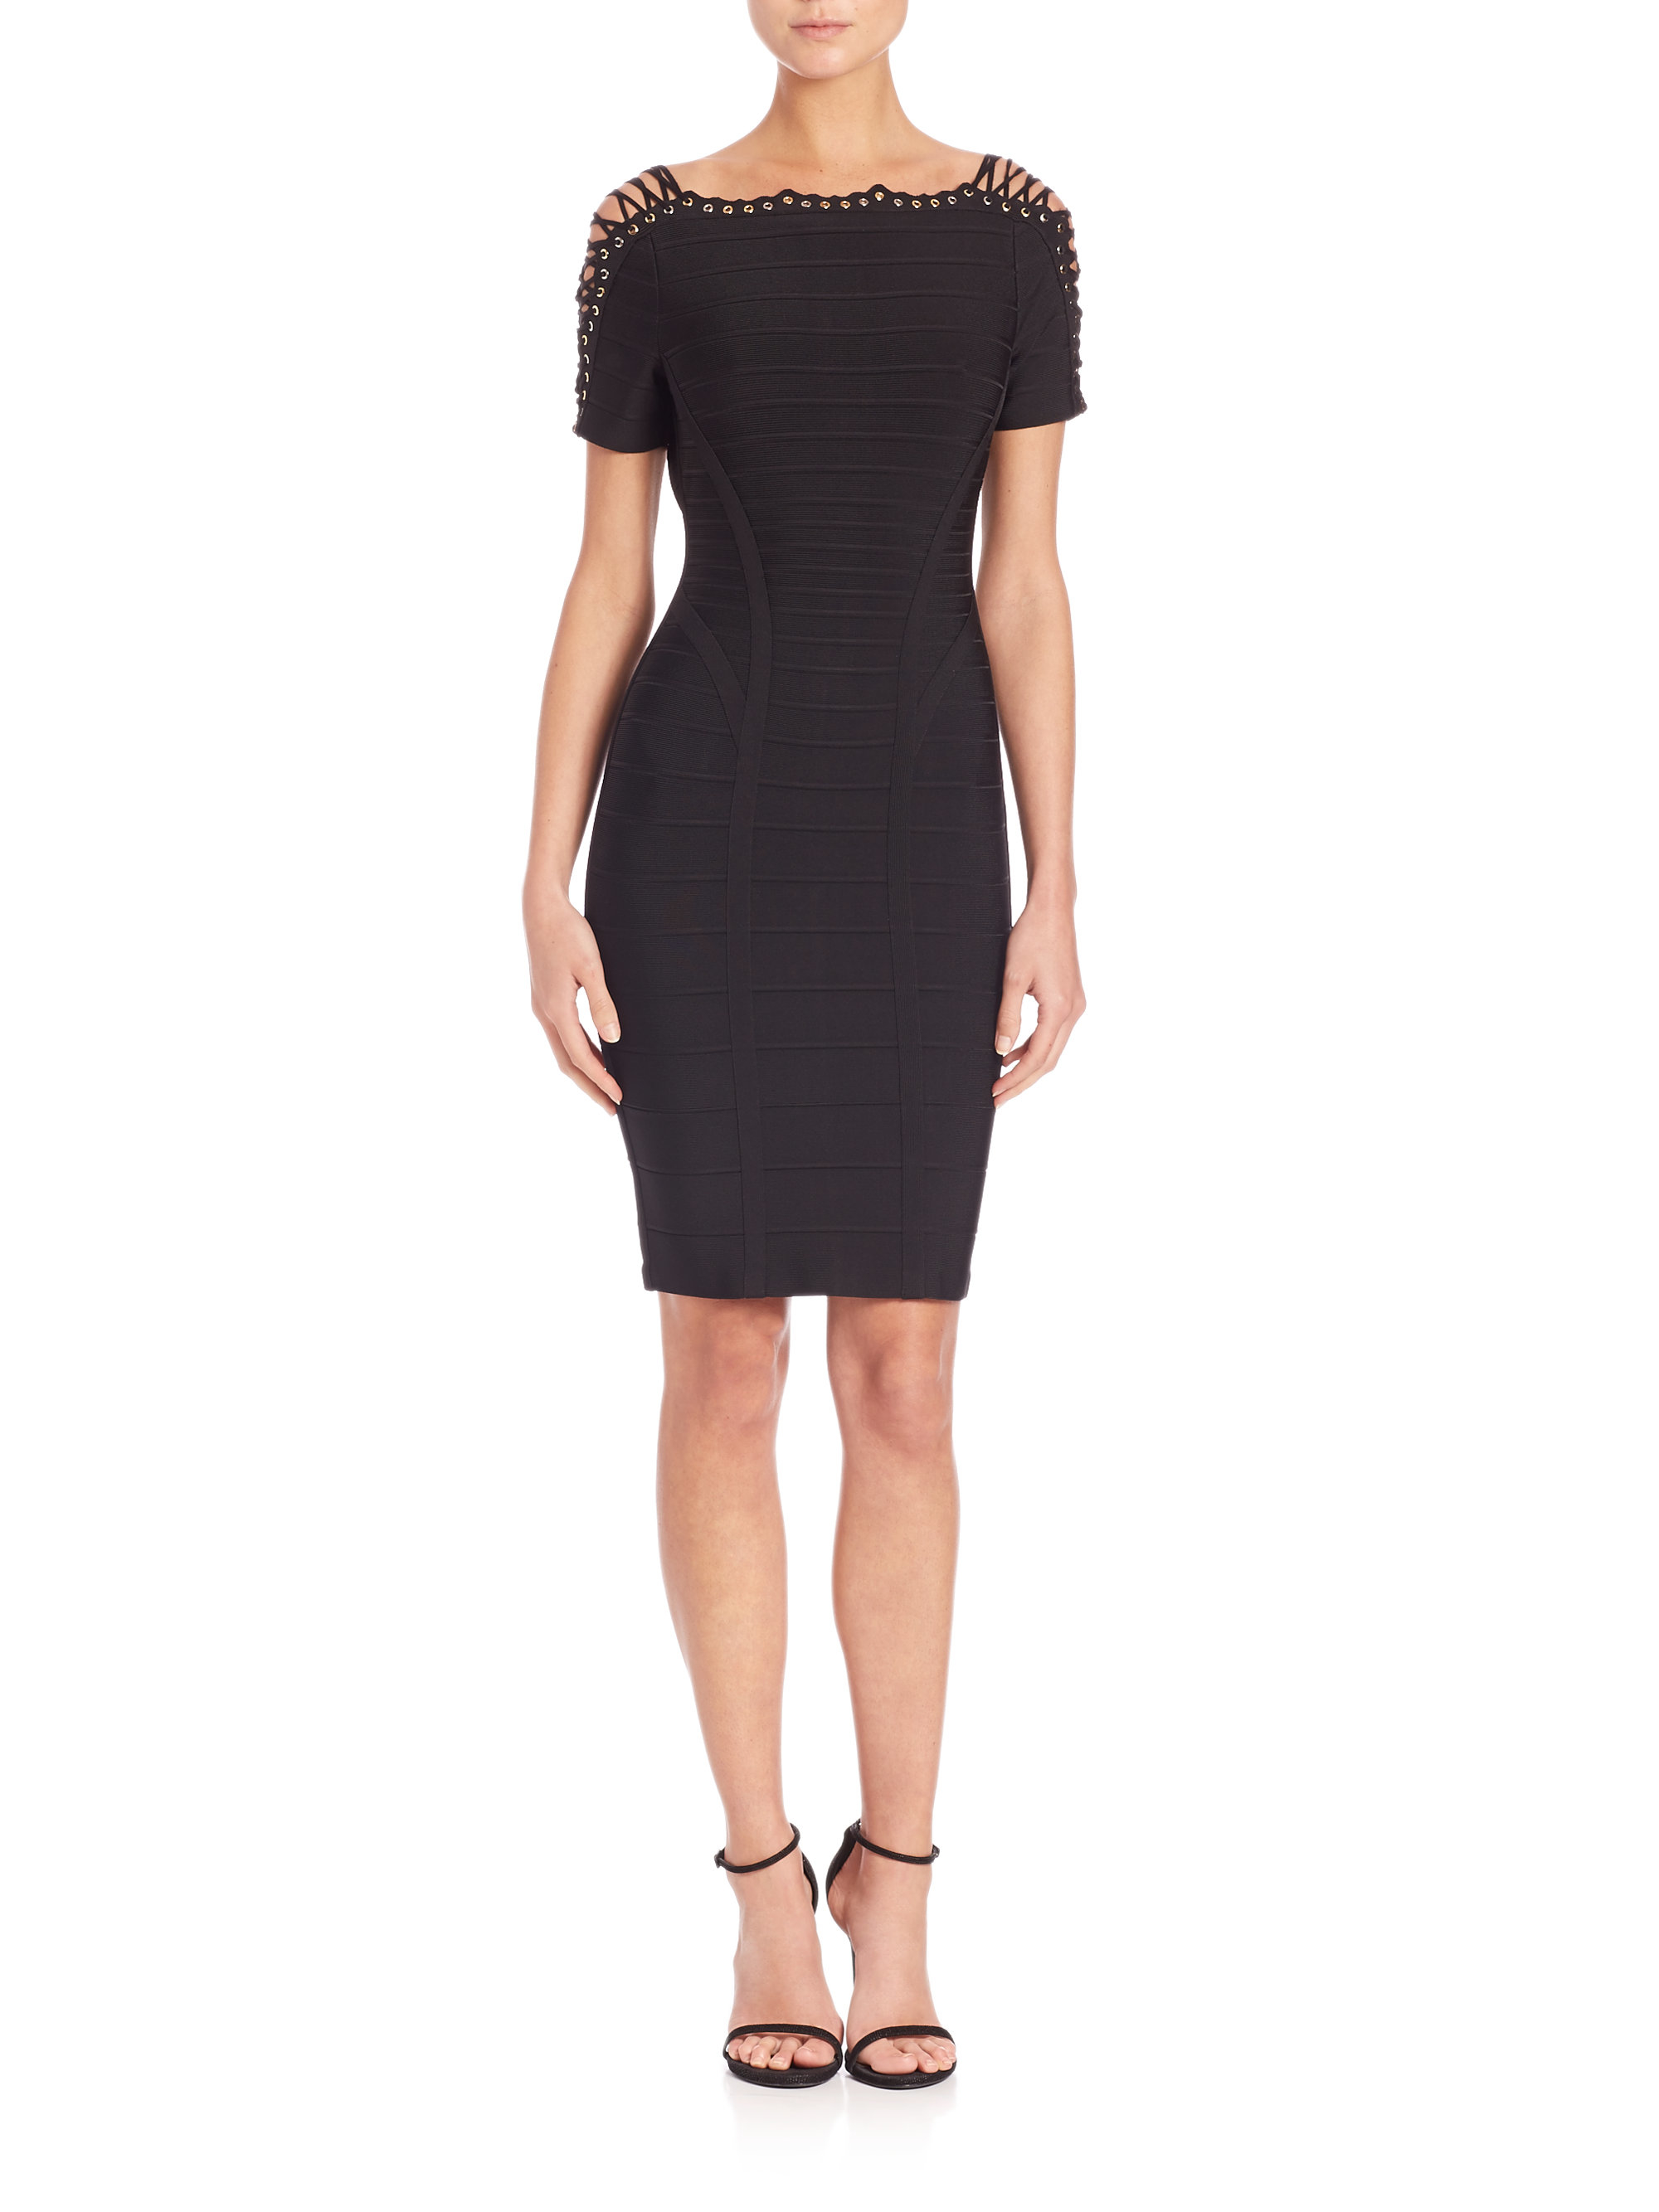 Hervé léger Lace-up Bandage Dress in Black (PACIFIC BLUE ...